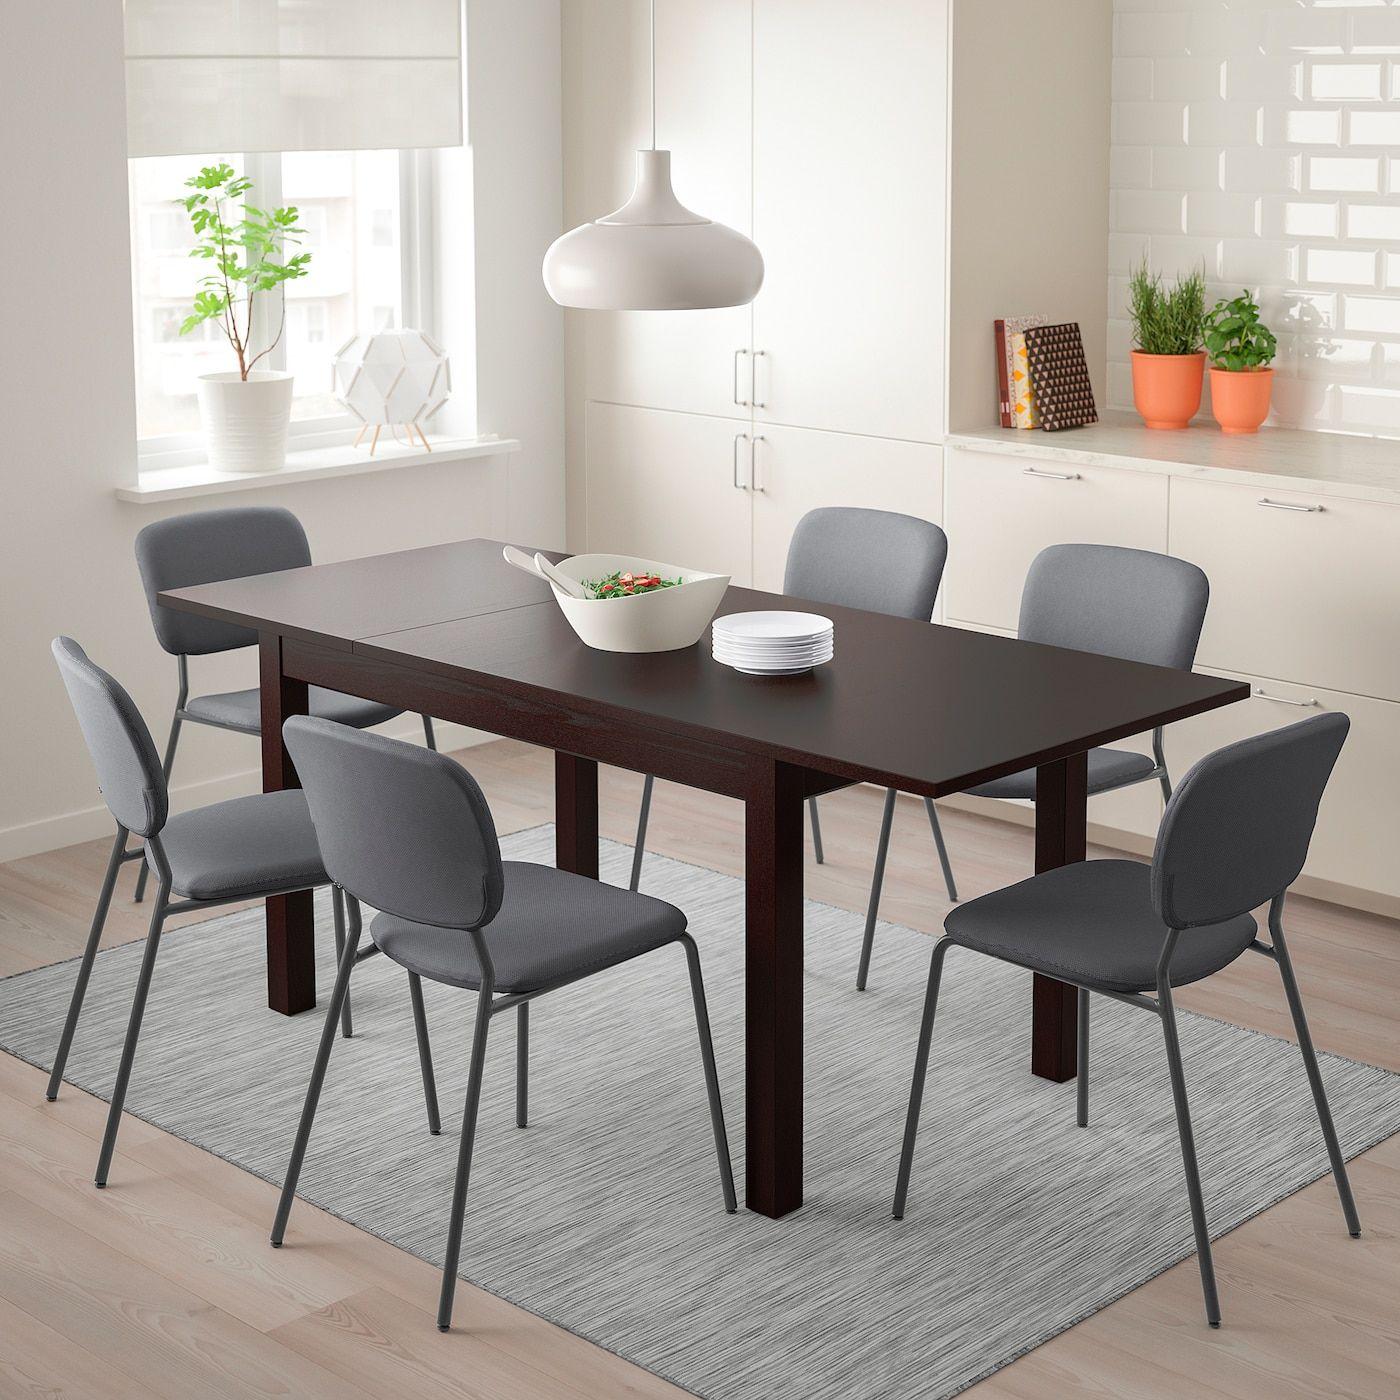 17+ Scratch resistant dining table set Best